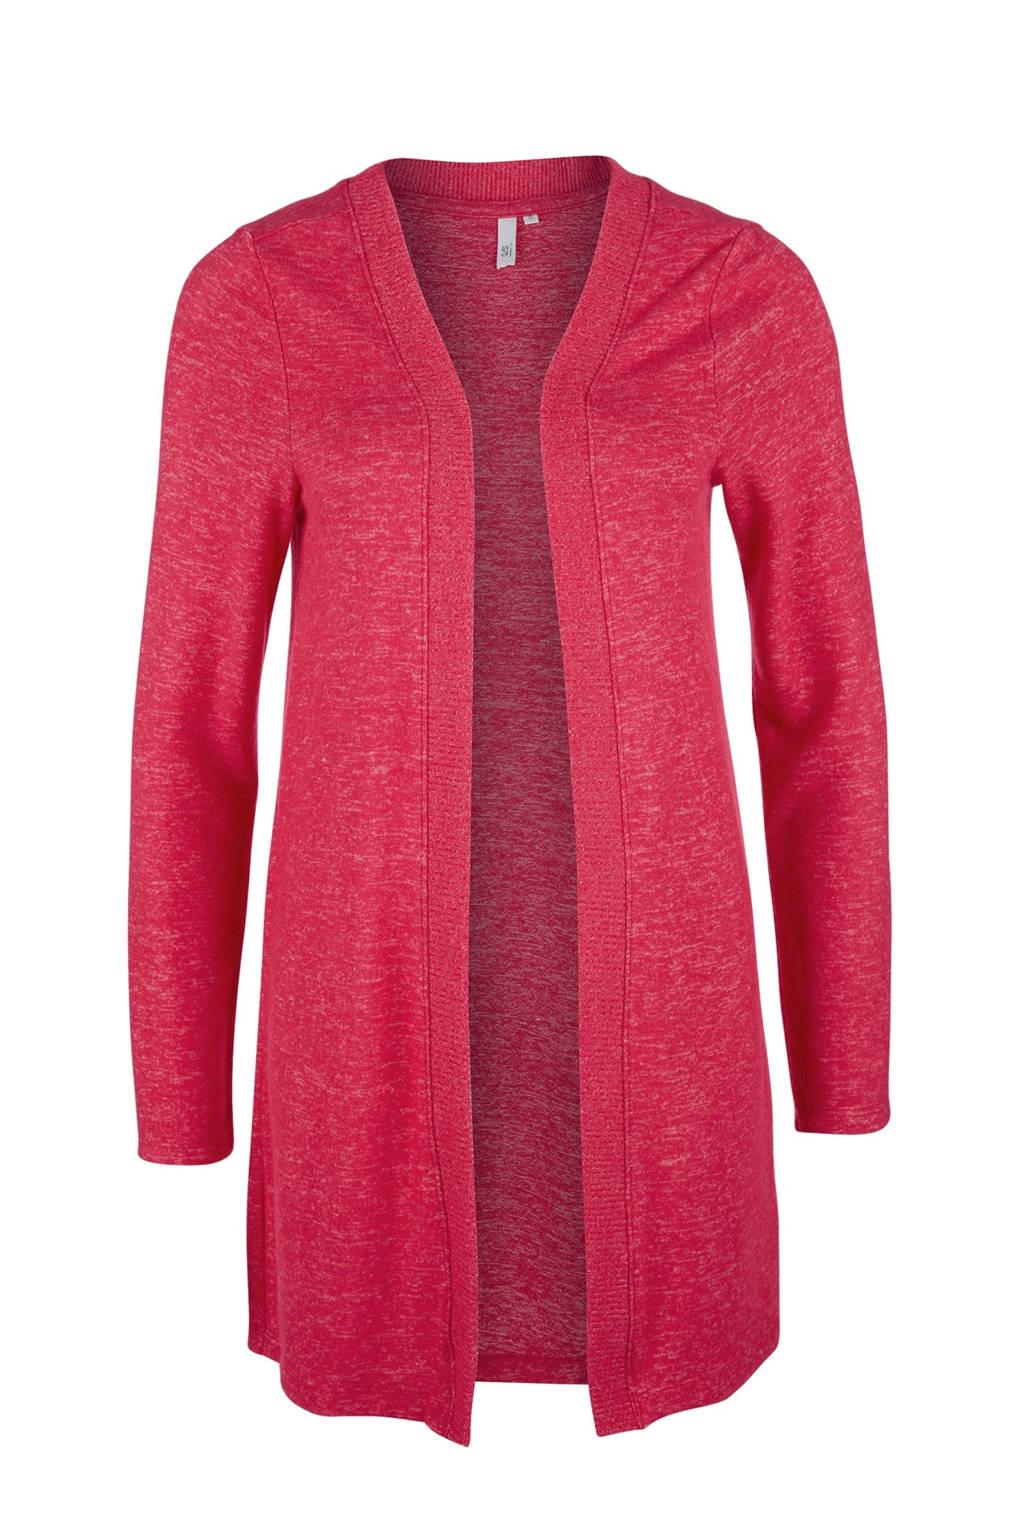 Q/S designed by gemêleerd vest roze, Roze